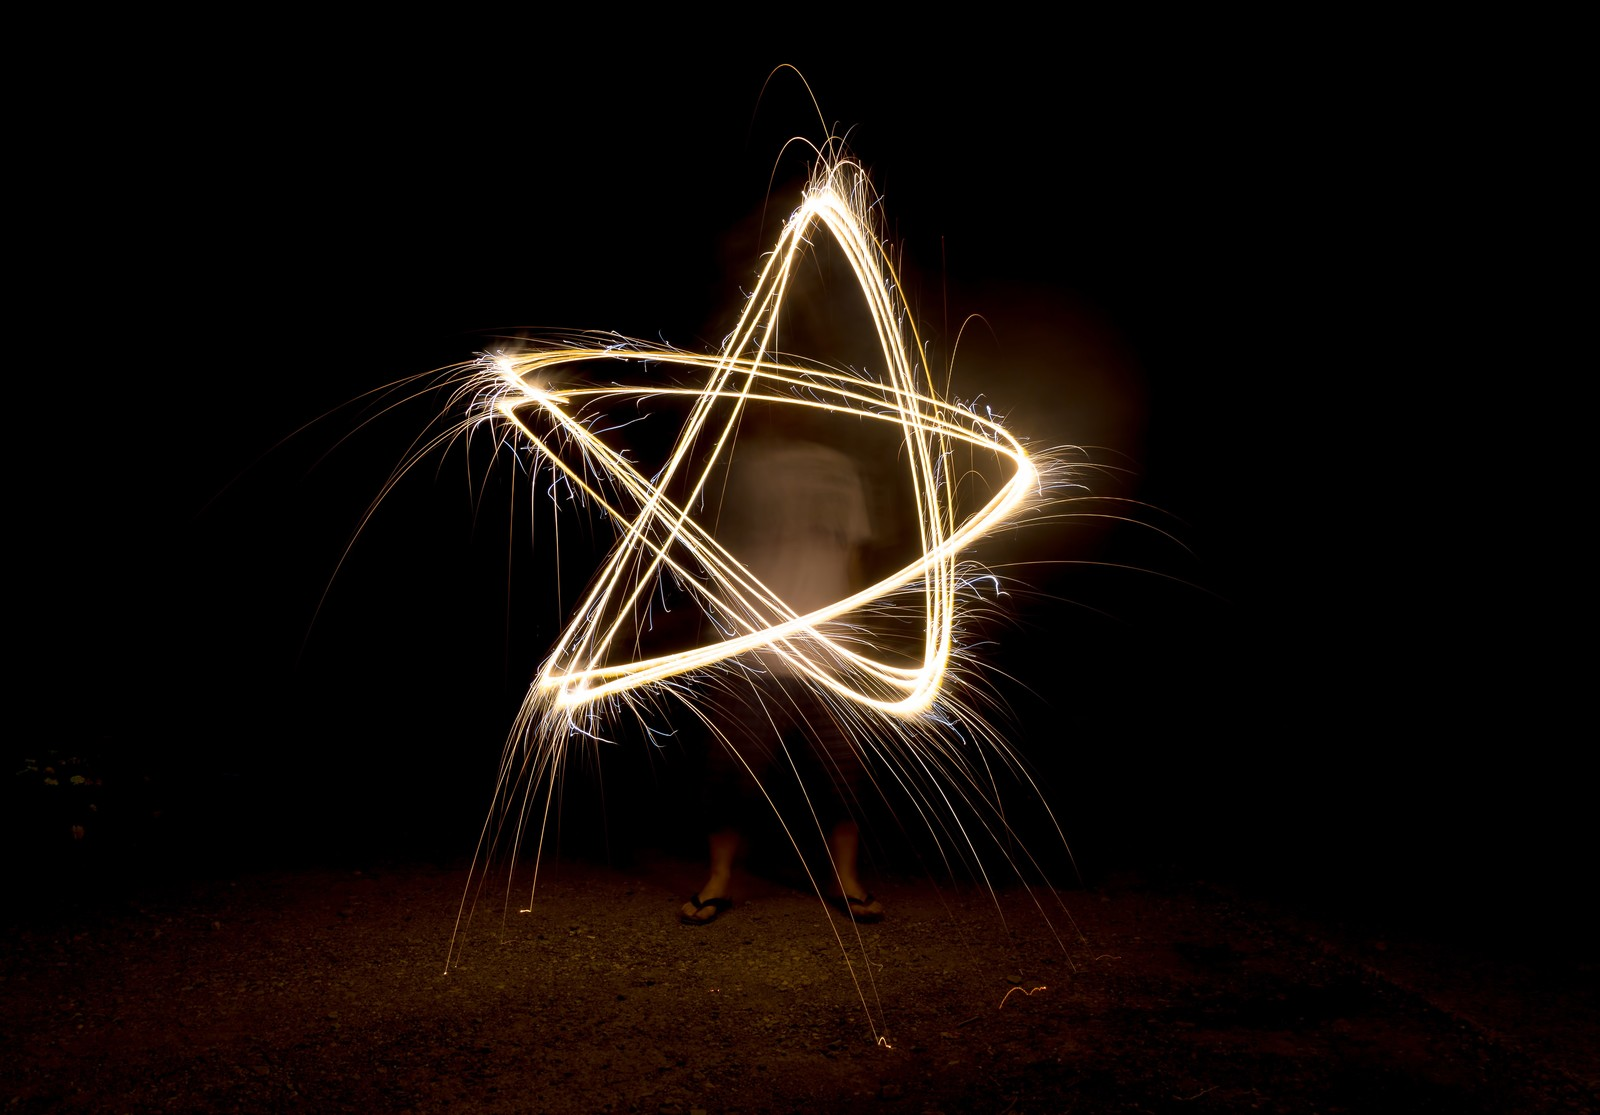 「手持ち花火で五芒星」の写真